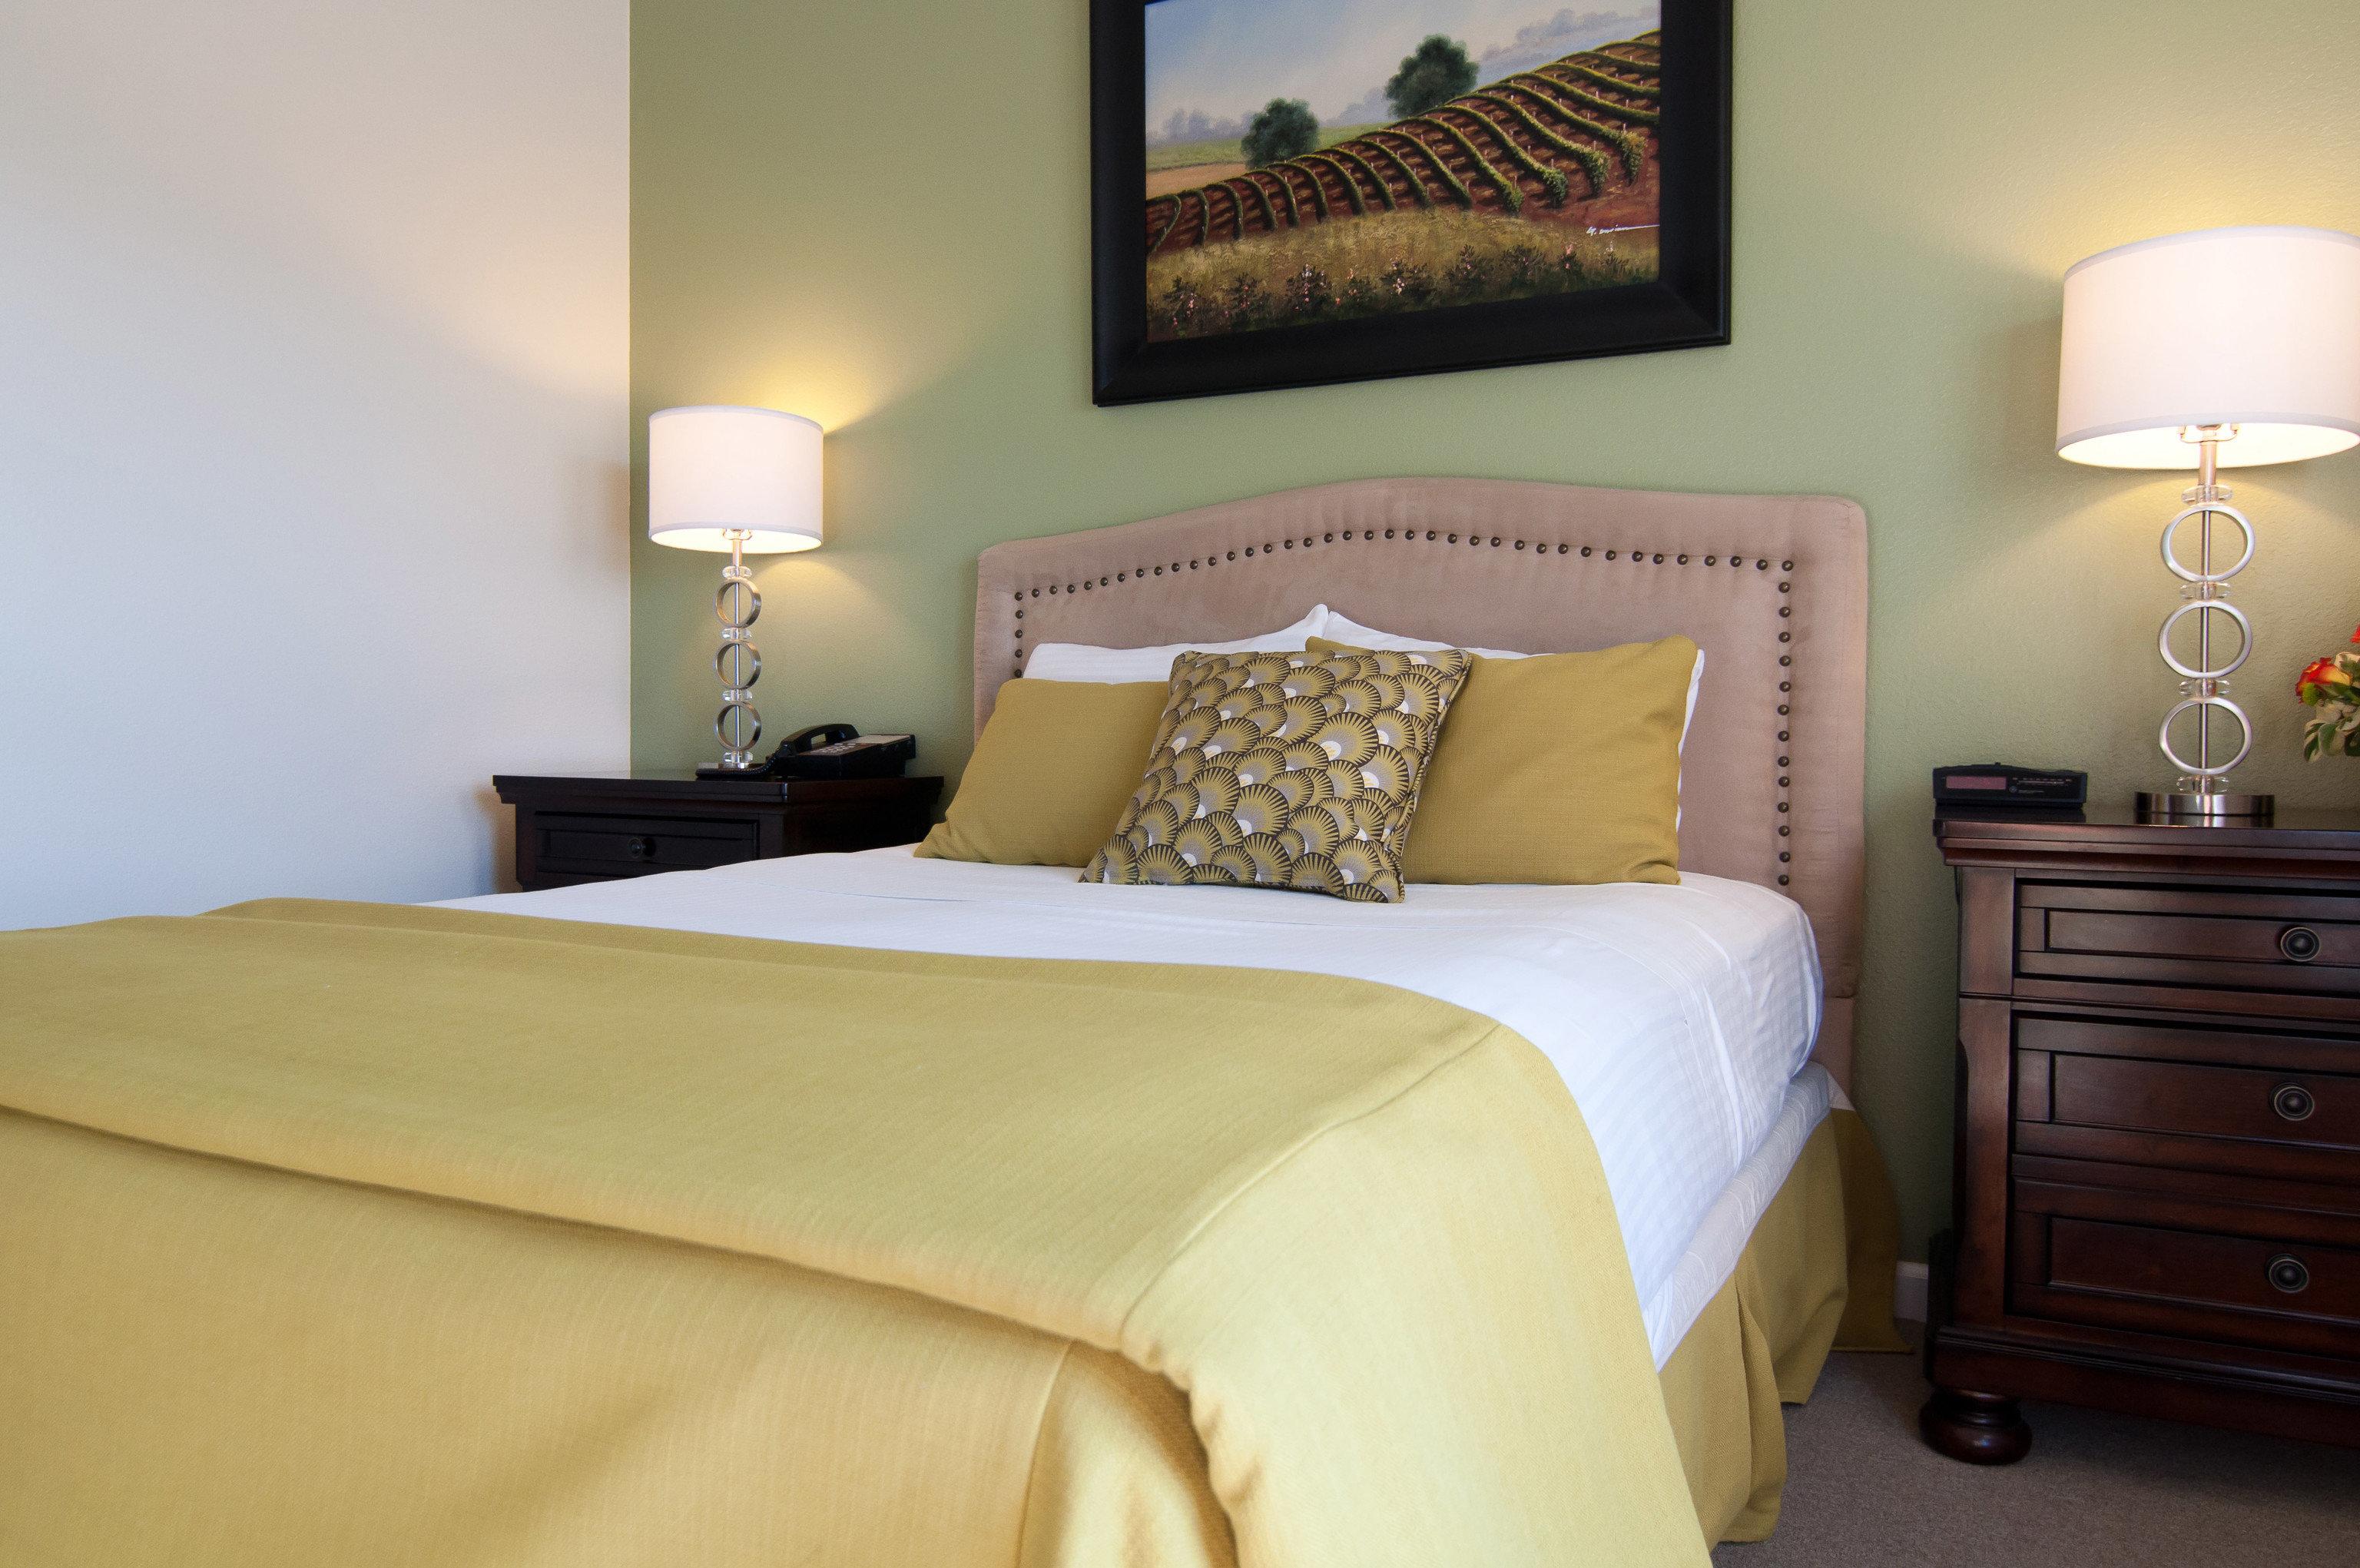 sofa Bedroom night property scene Suite bed sheet cottage lamp pillow bed frame